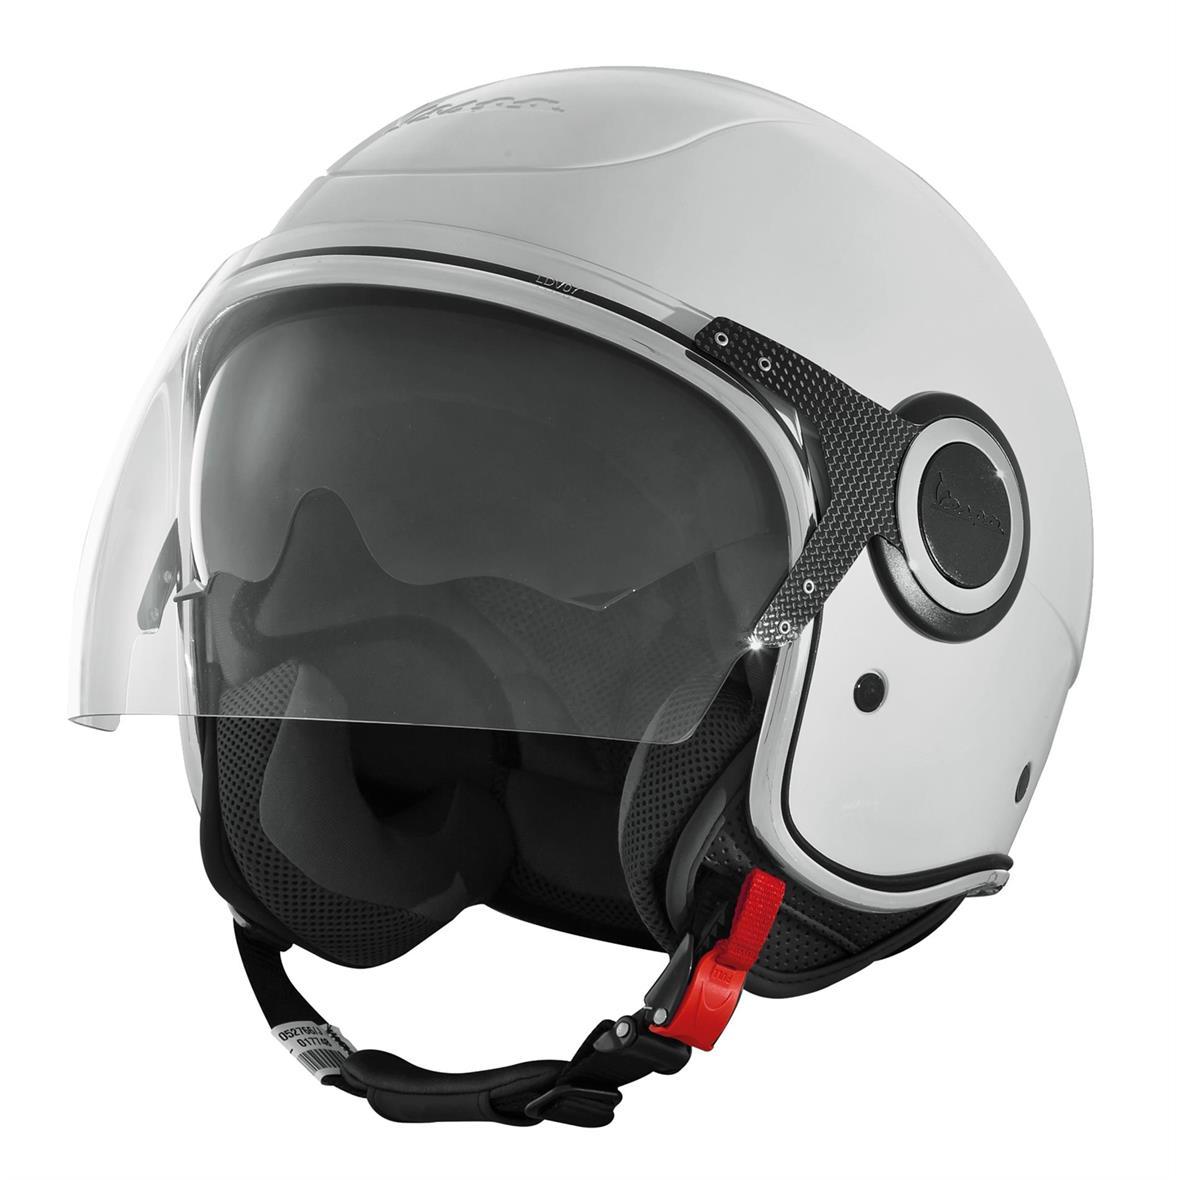 Product Image for 'Helmet PIAGGIO Vespa VJ 70 yearsTitle'